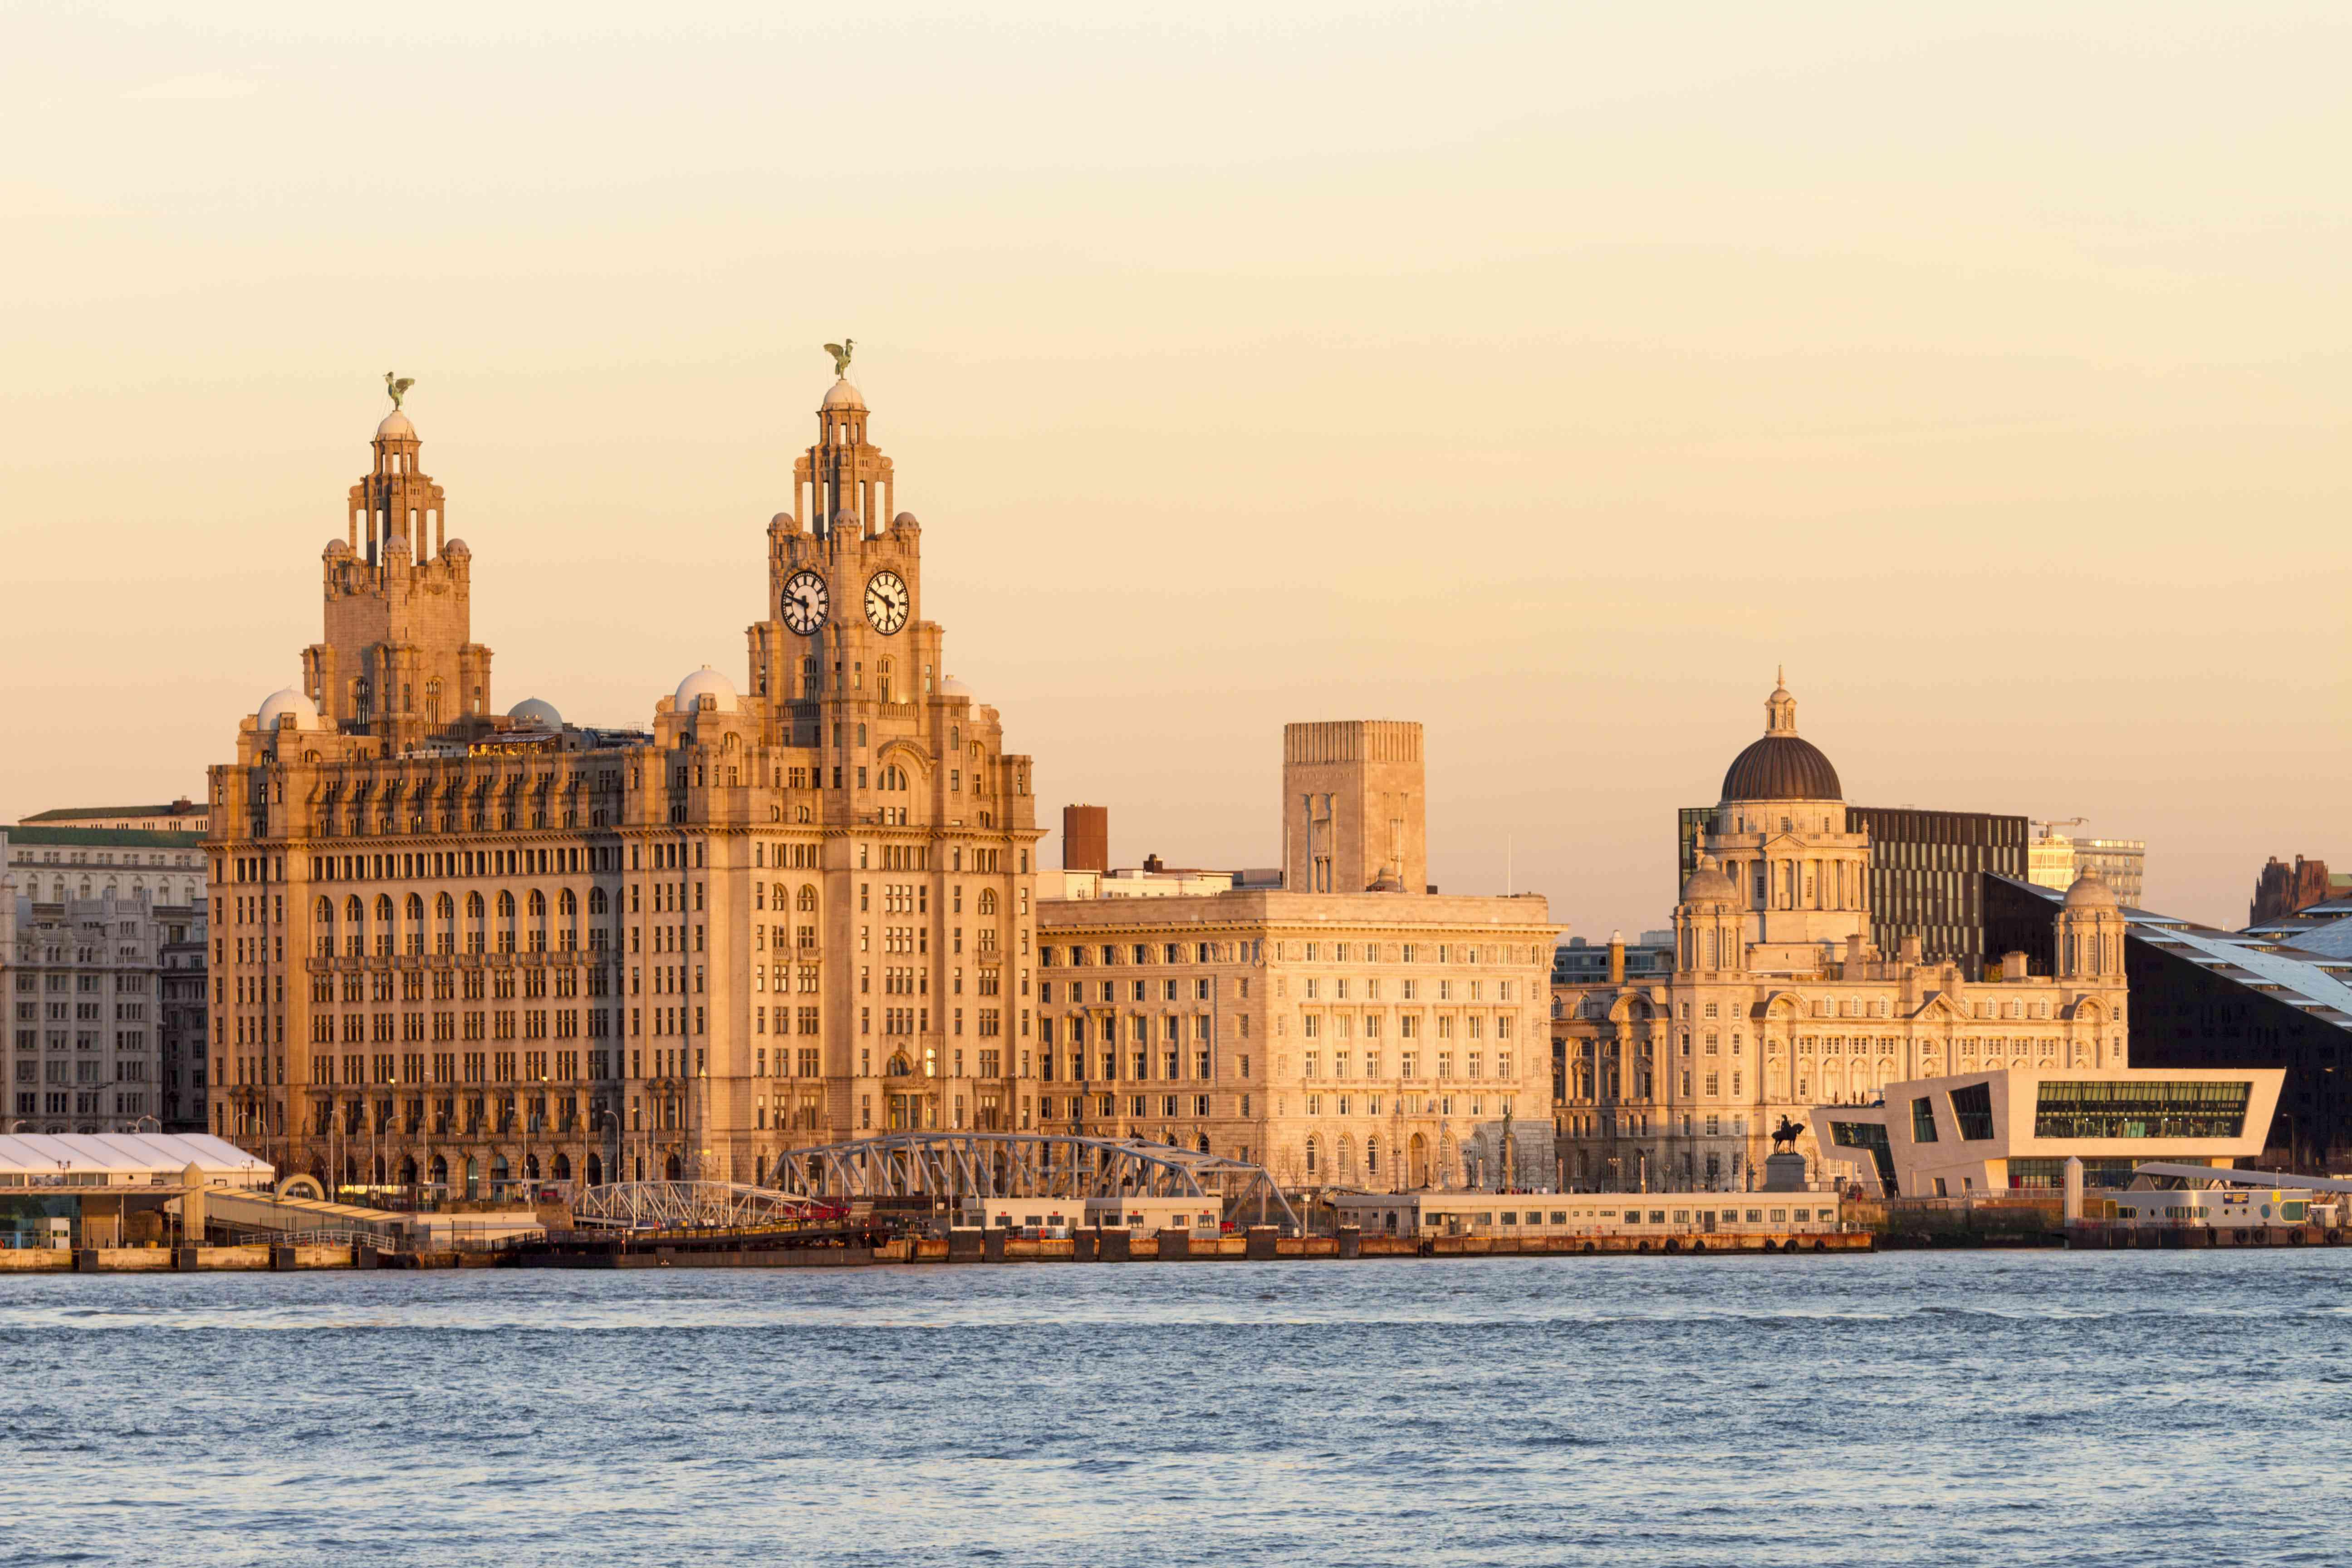 Liverpool UNESCO waterfront skyline